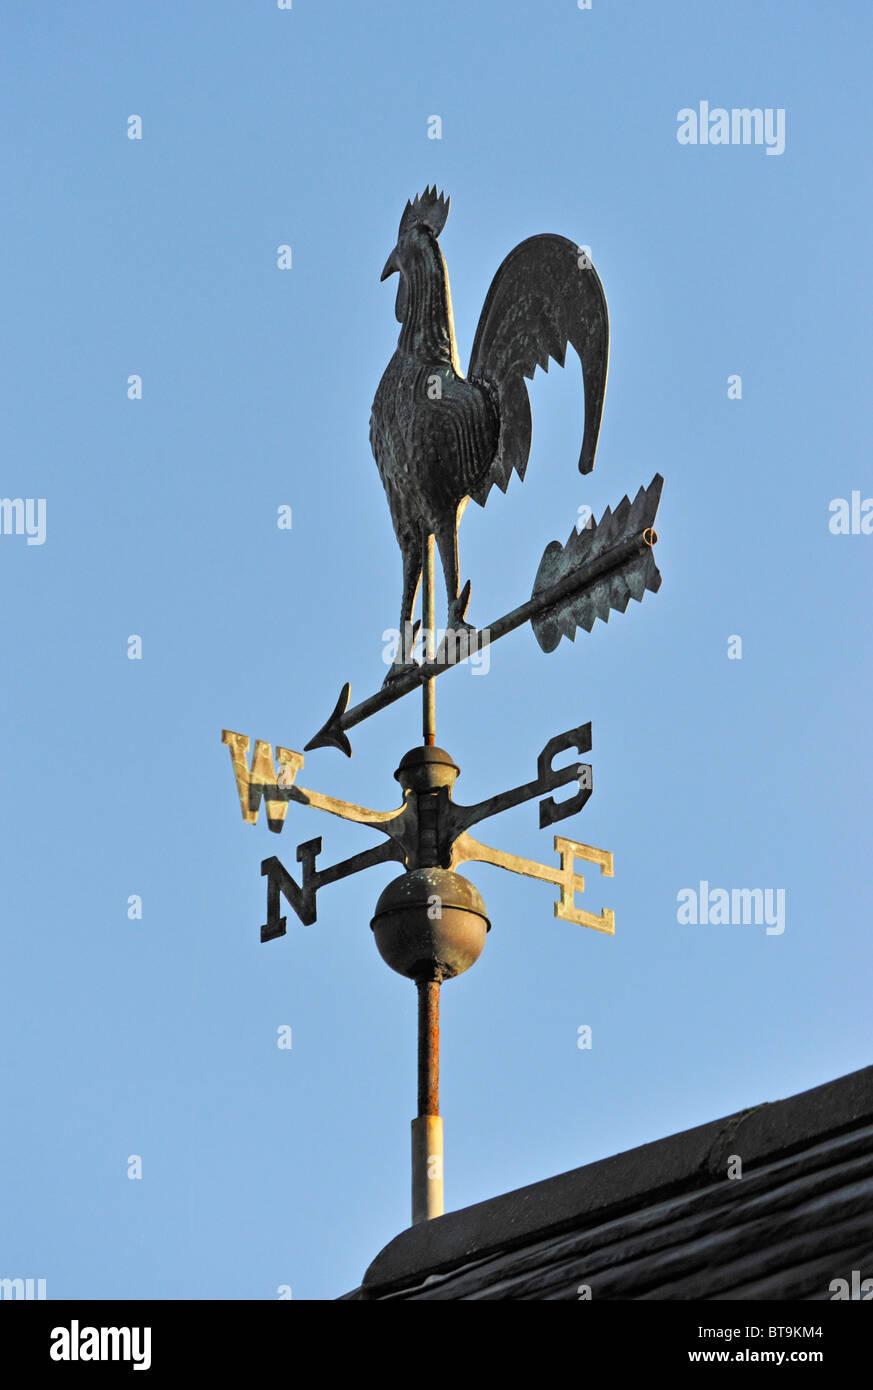 Cockerel weathervane. Garth Heads, Kendal, Cumbria, England, United Kingdom, Europe. - Stock Image